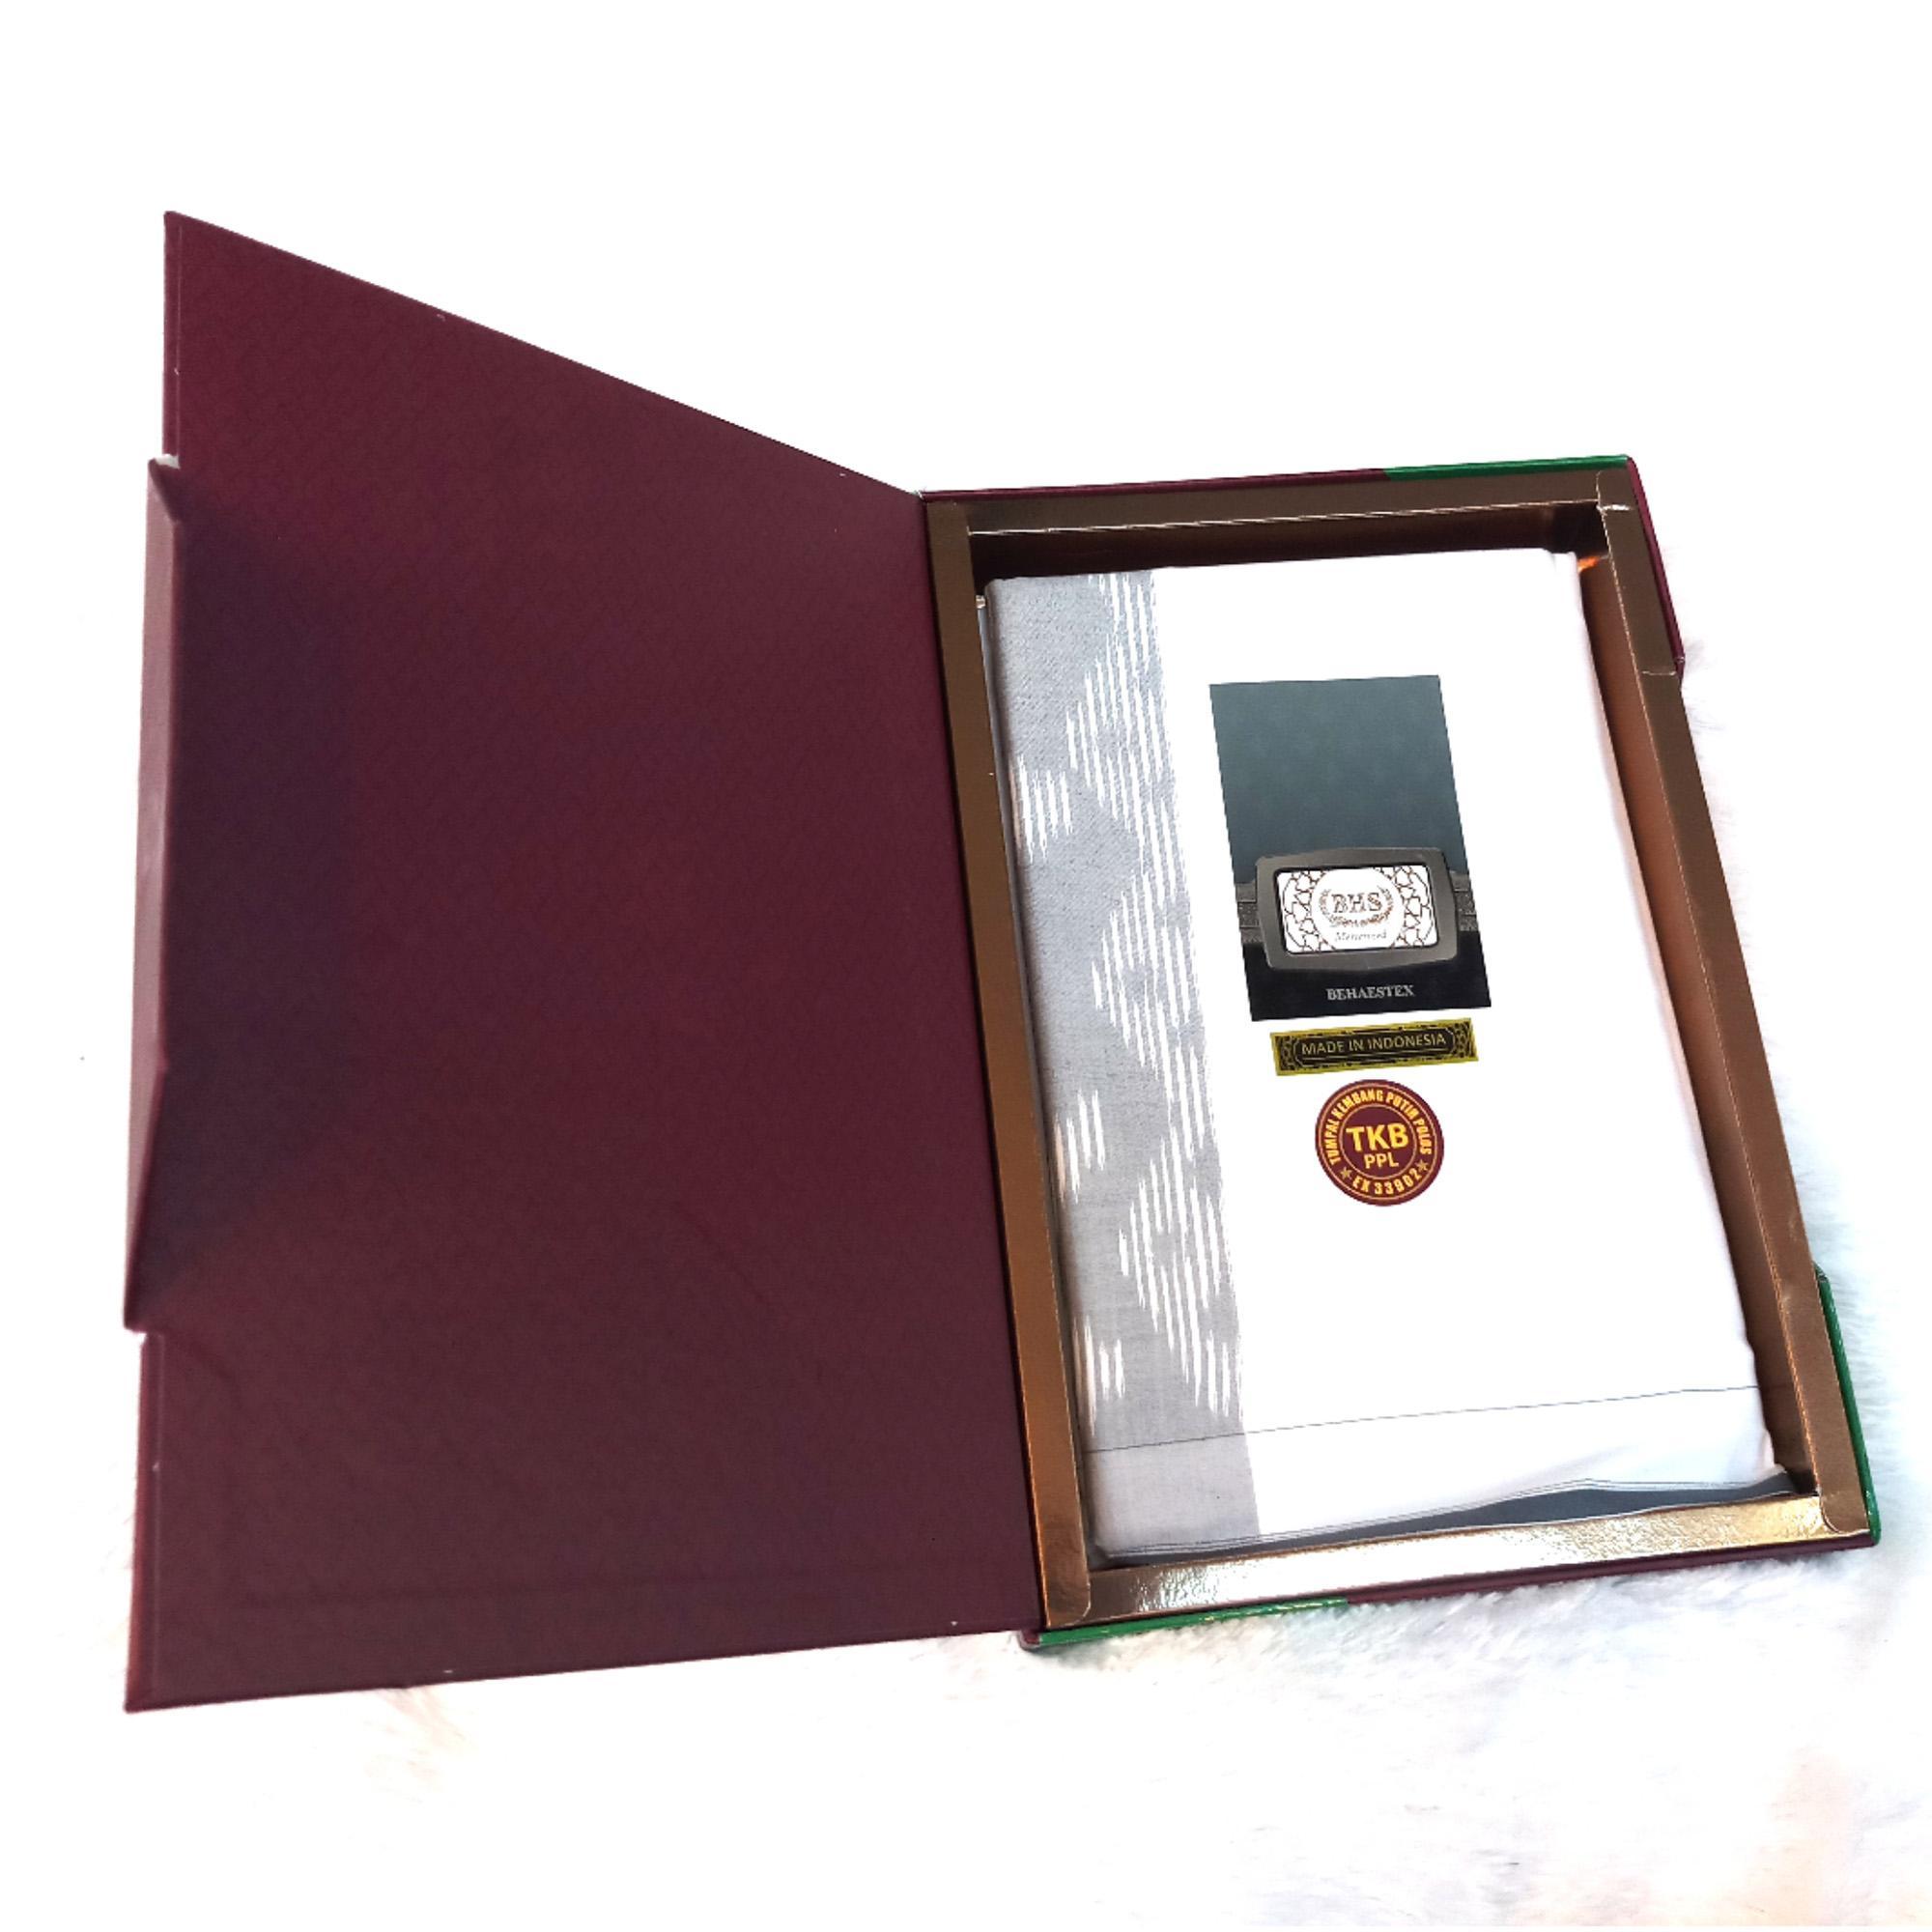 Sarung BHS Mercerized Original Hitam dan Putih Polos Mesres Murah Premium (ASLI) Bukan Afkir - Jaya Makmur Leo